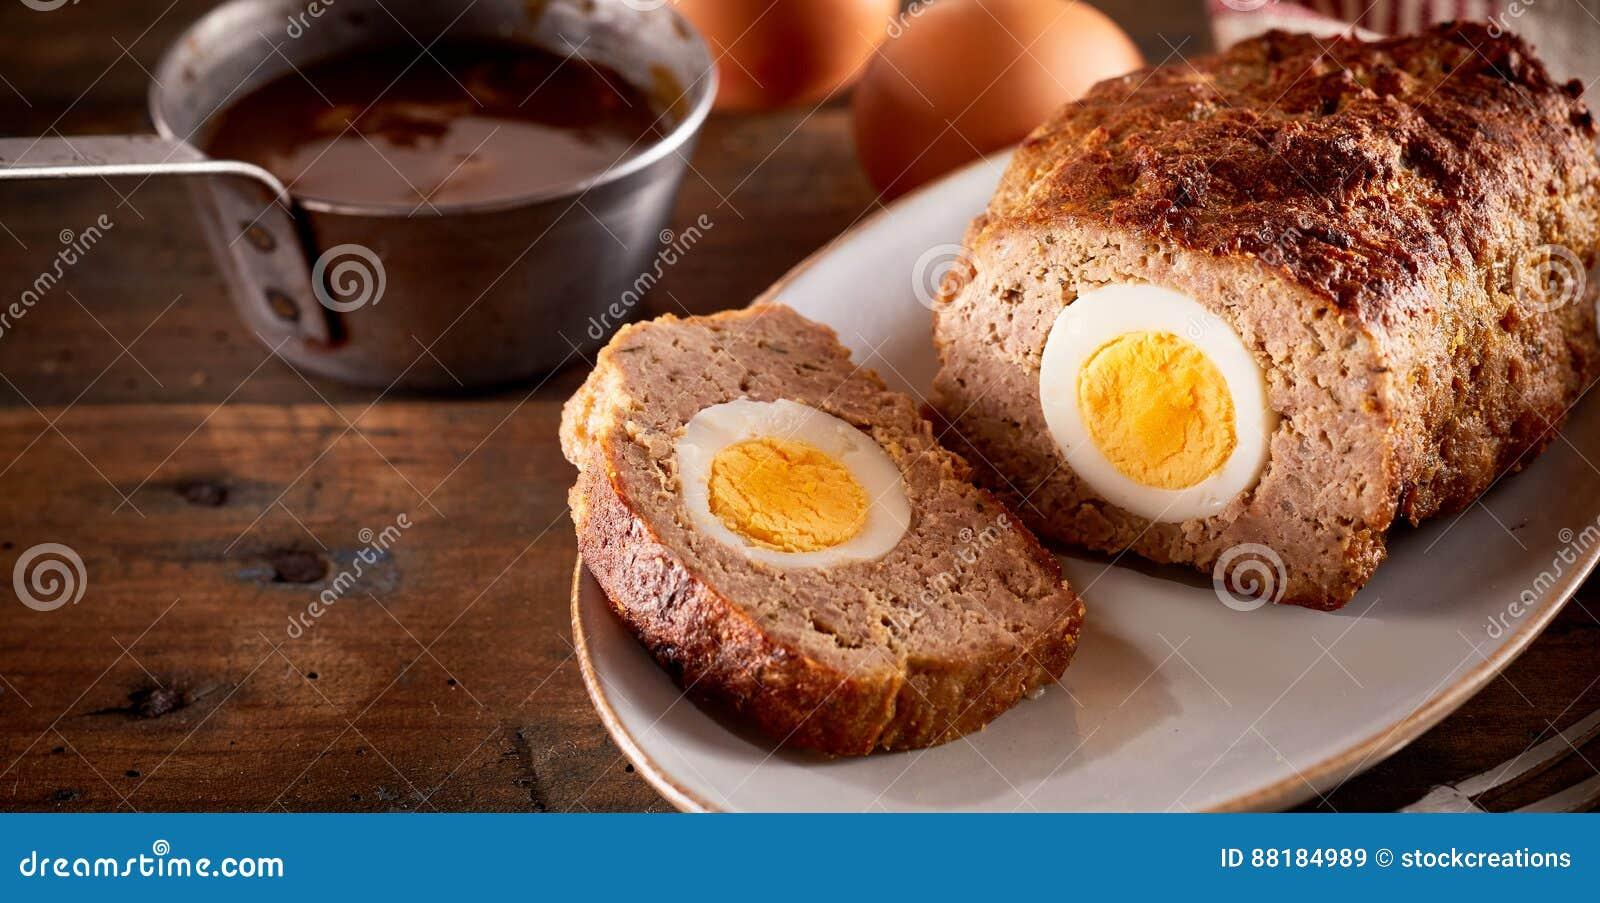 Meatloaf com ovo